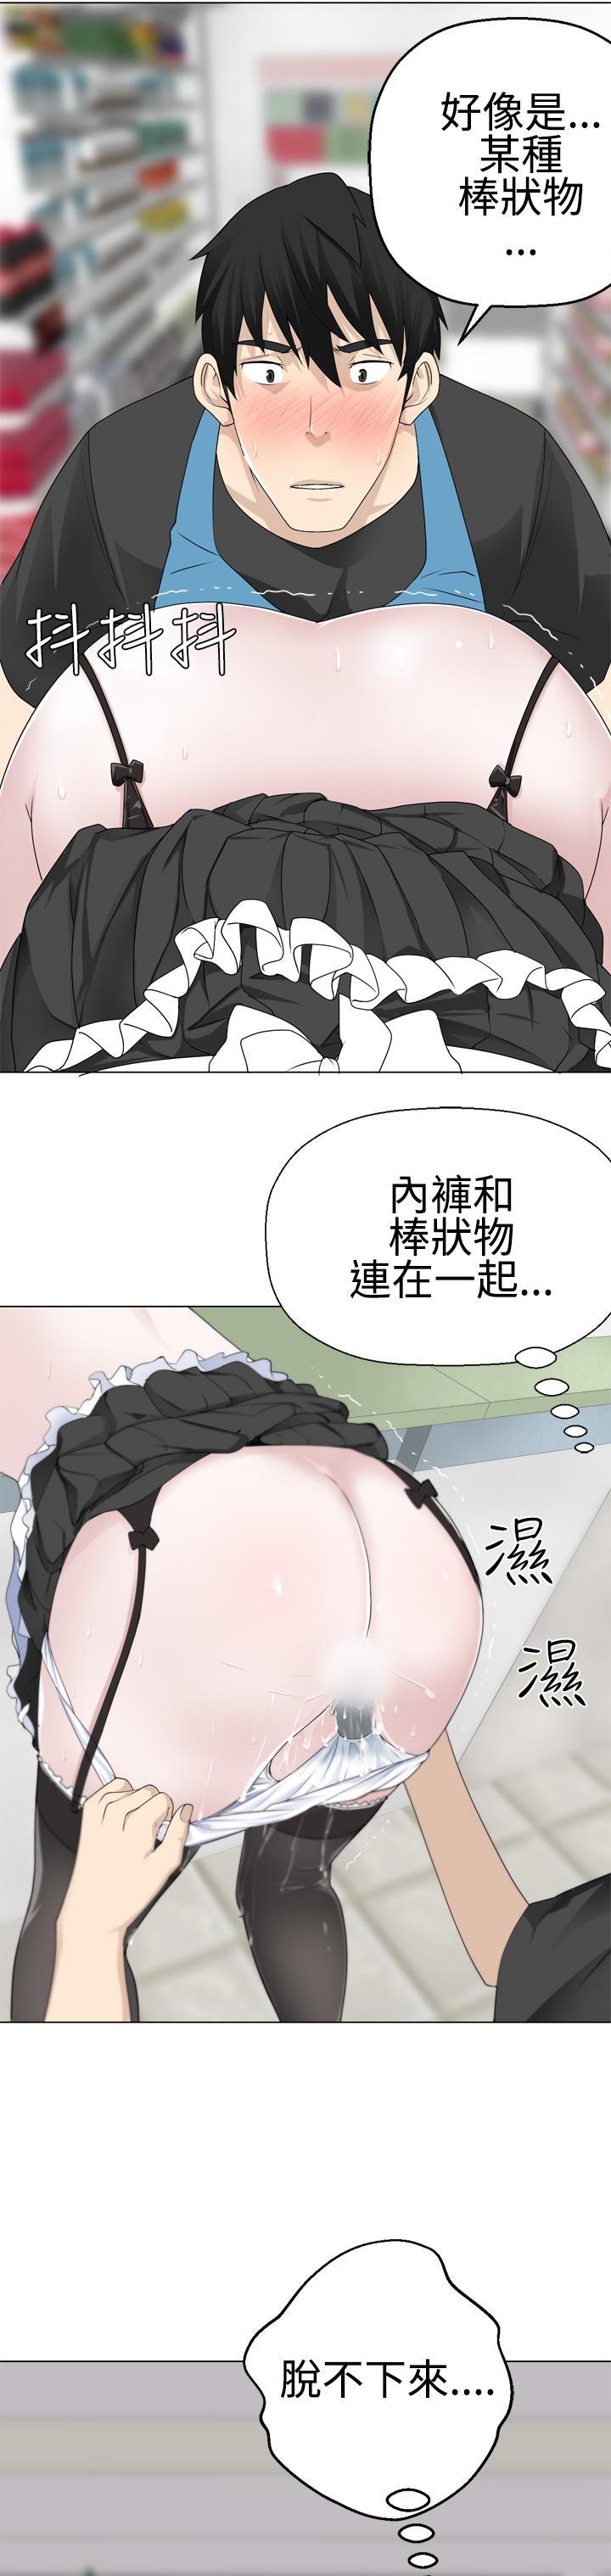 [SOSO] Franken Jo 为爱而生 法兰克赵 Ch.1~19 [Chinese]中文 220